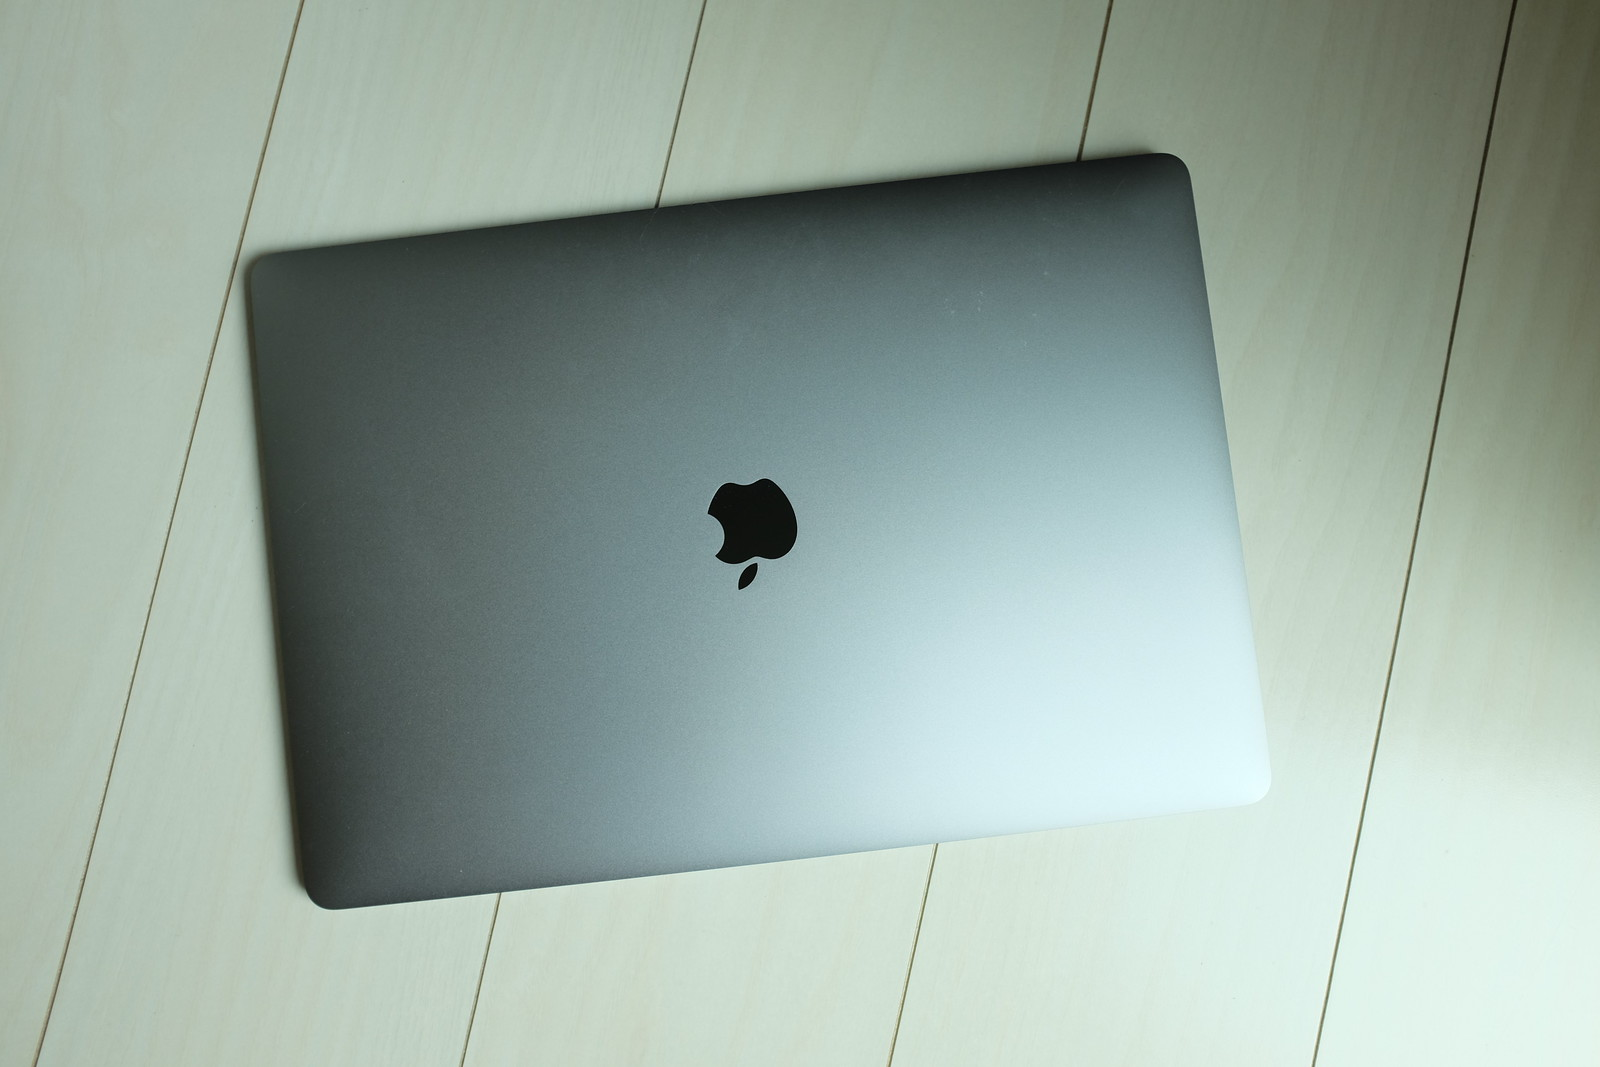 MacBook Pro (Late 2016)